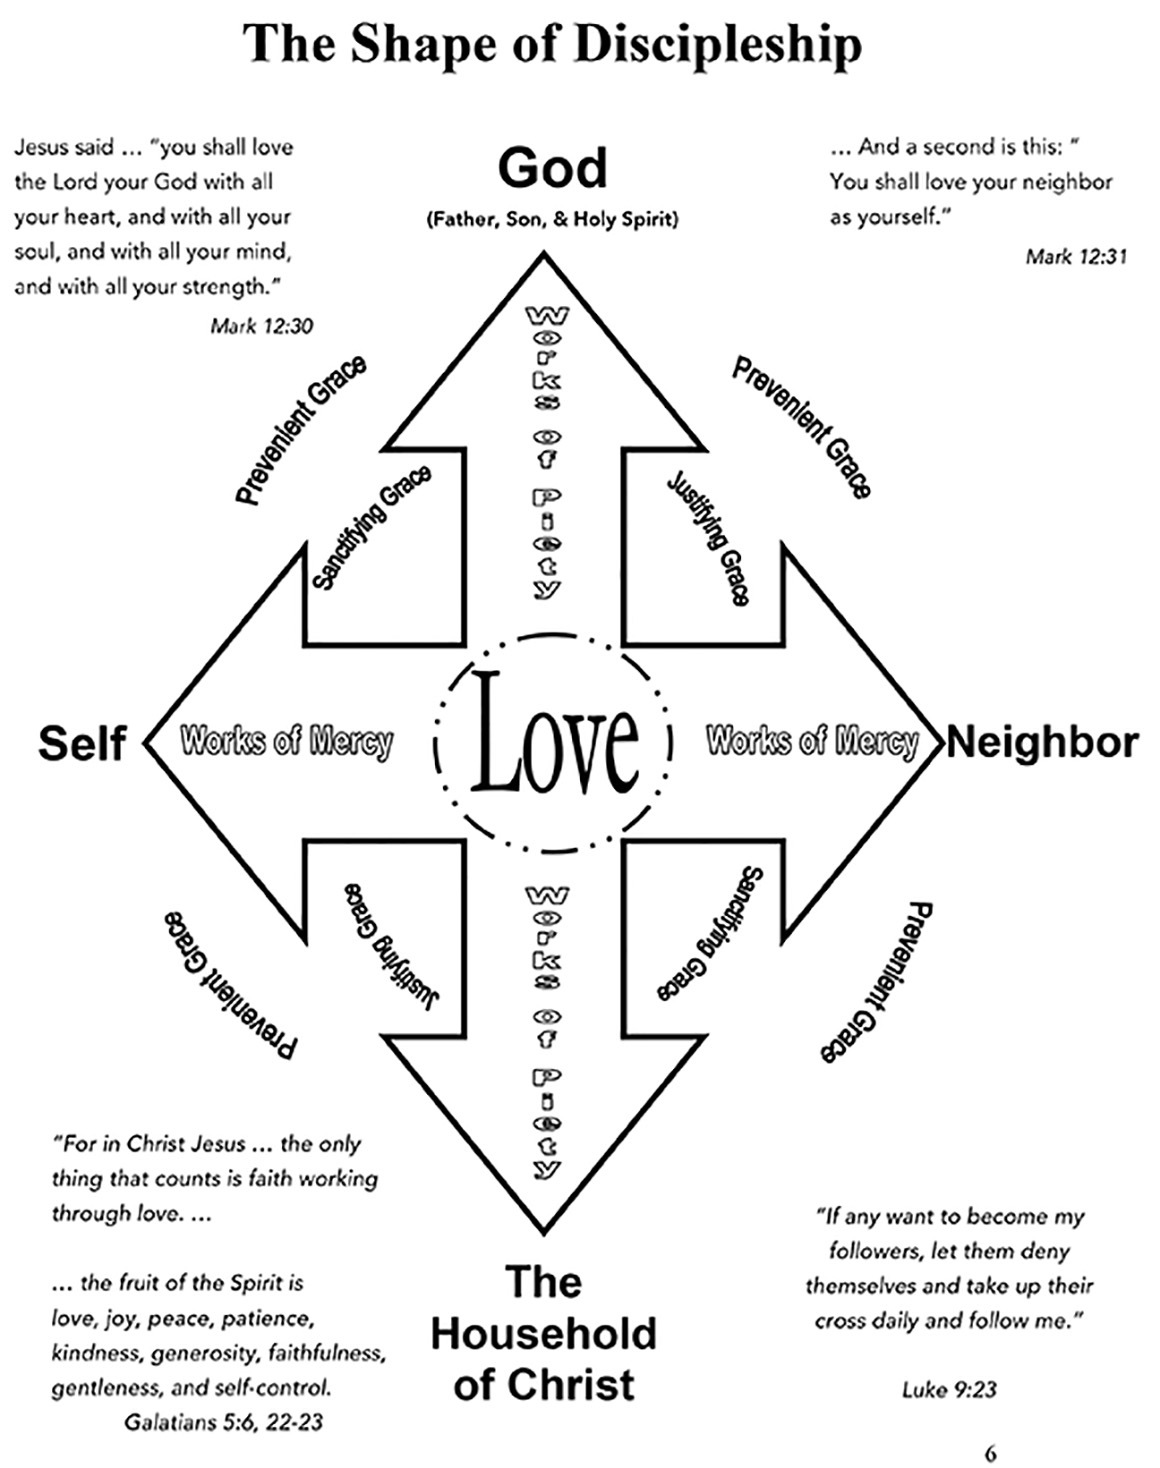 The shape of discipleship jpeg